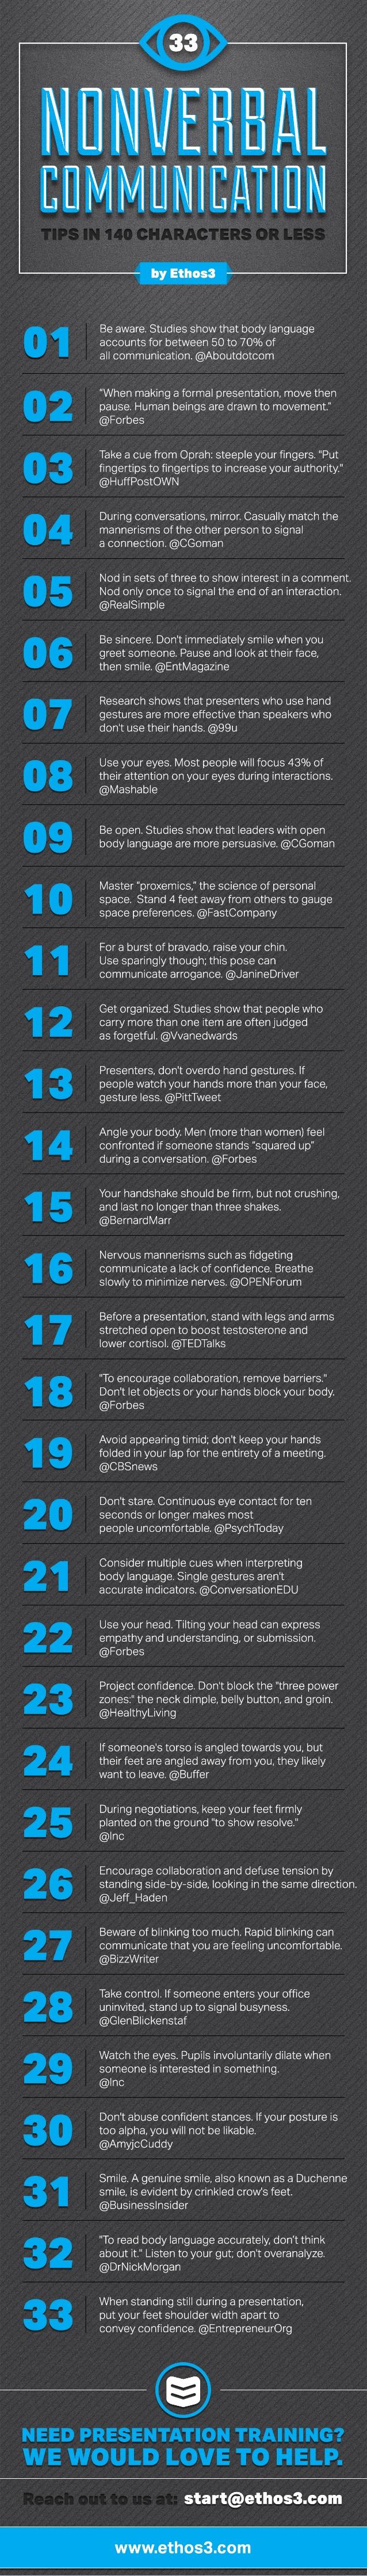 33 consejos sobre comunicación no verbal en 140 caracteres